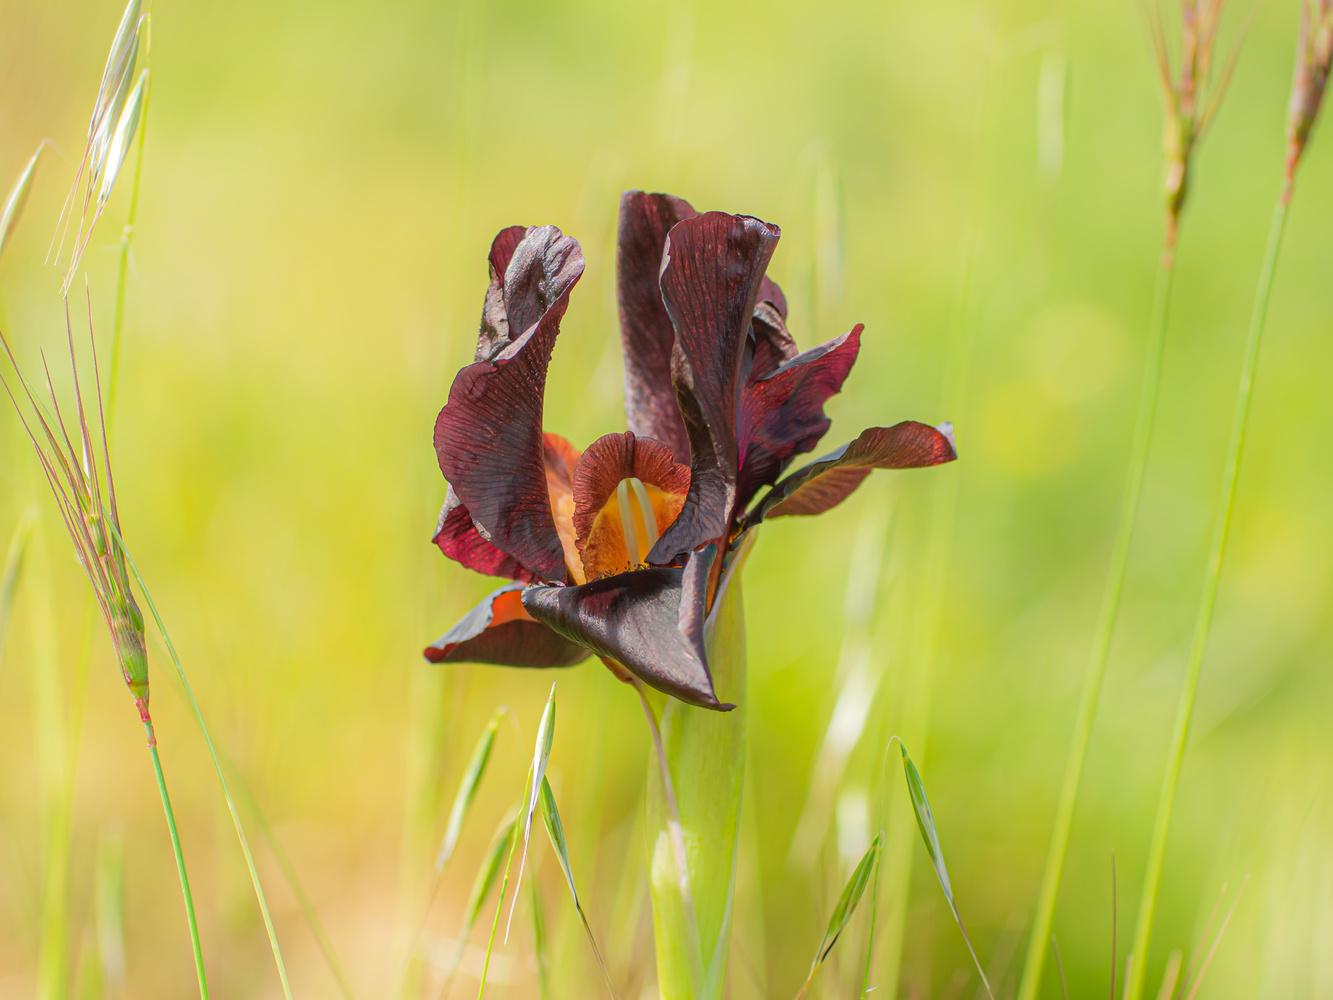 The crimson iris by Gotcha Biniashvili